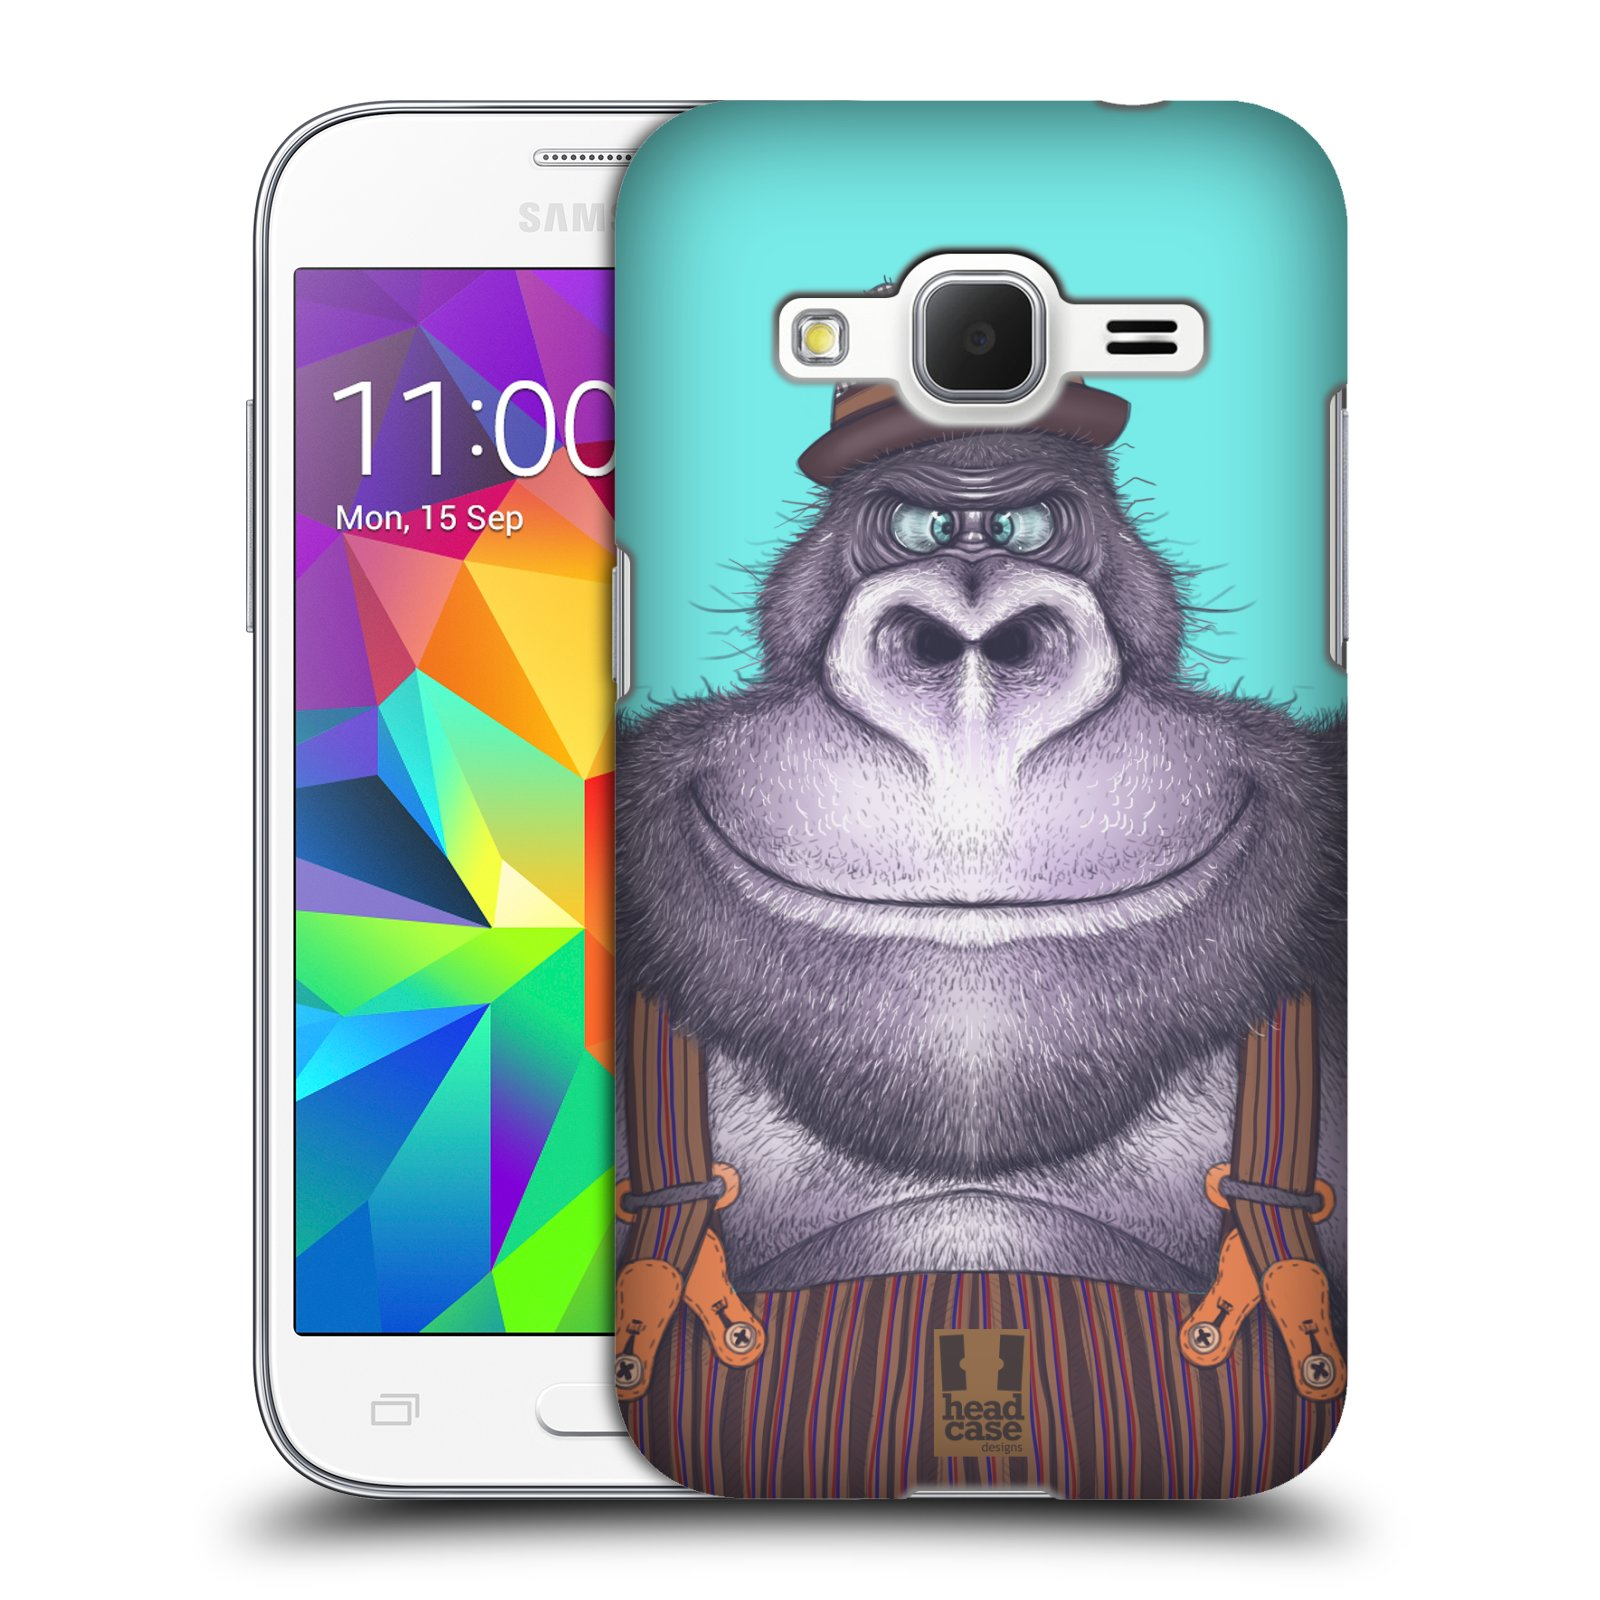 HEAD CASE plastový obal na mobil SAMSUNG GALAXY Core Prime (Core Prime VE) vzor Kreslená zvířátka gorila